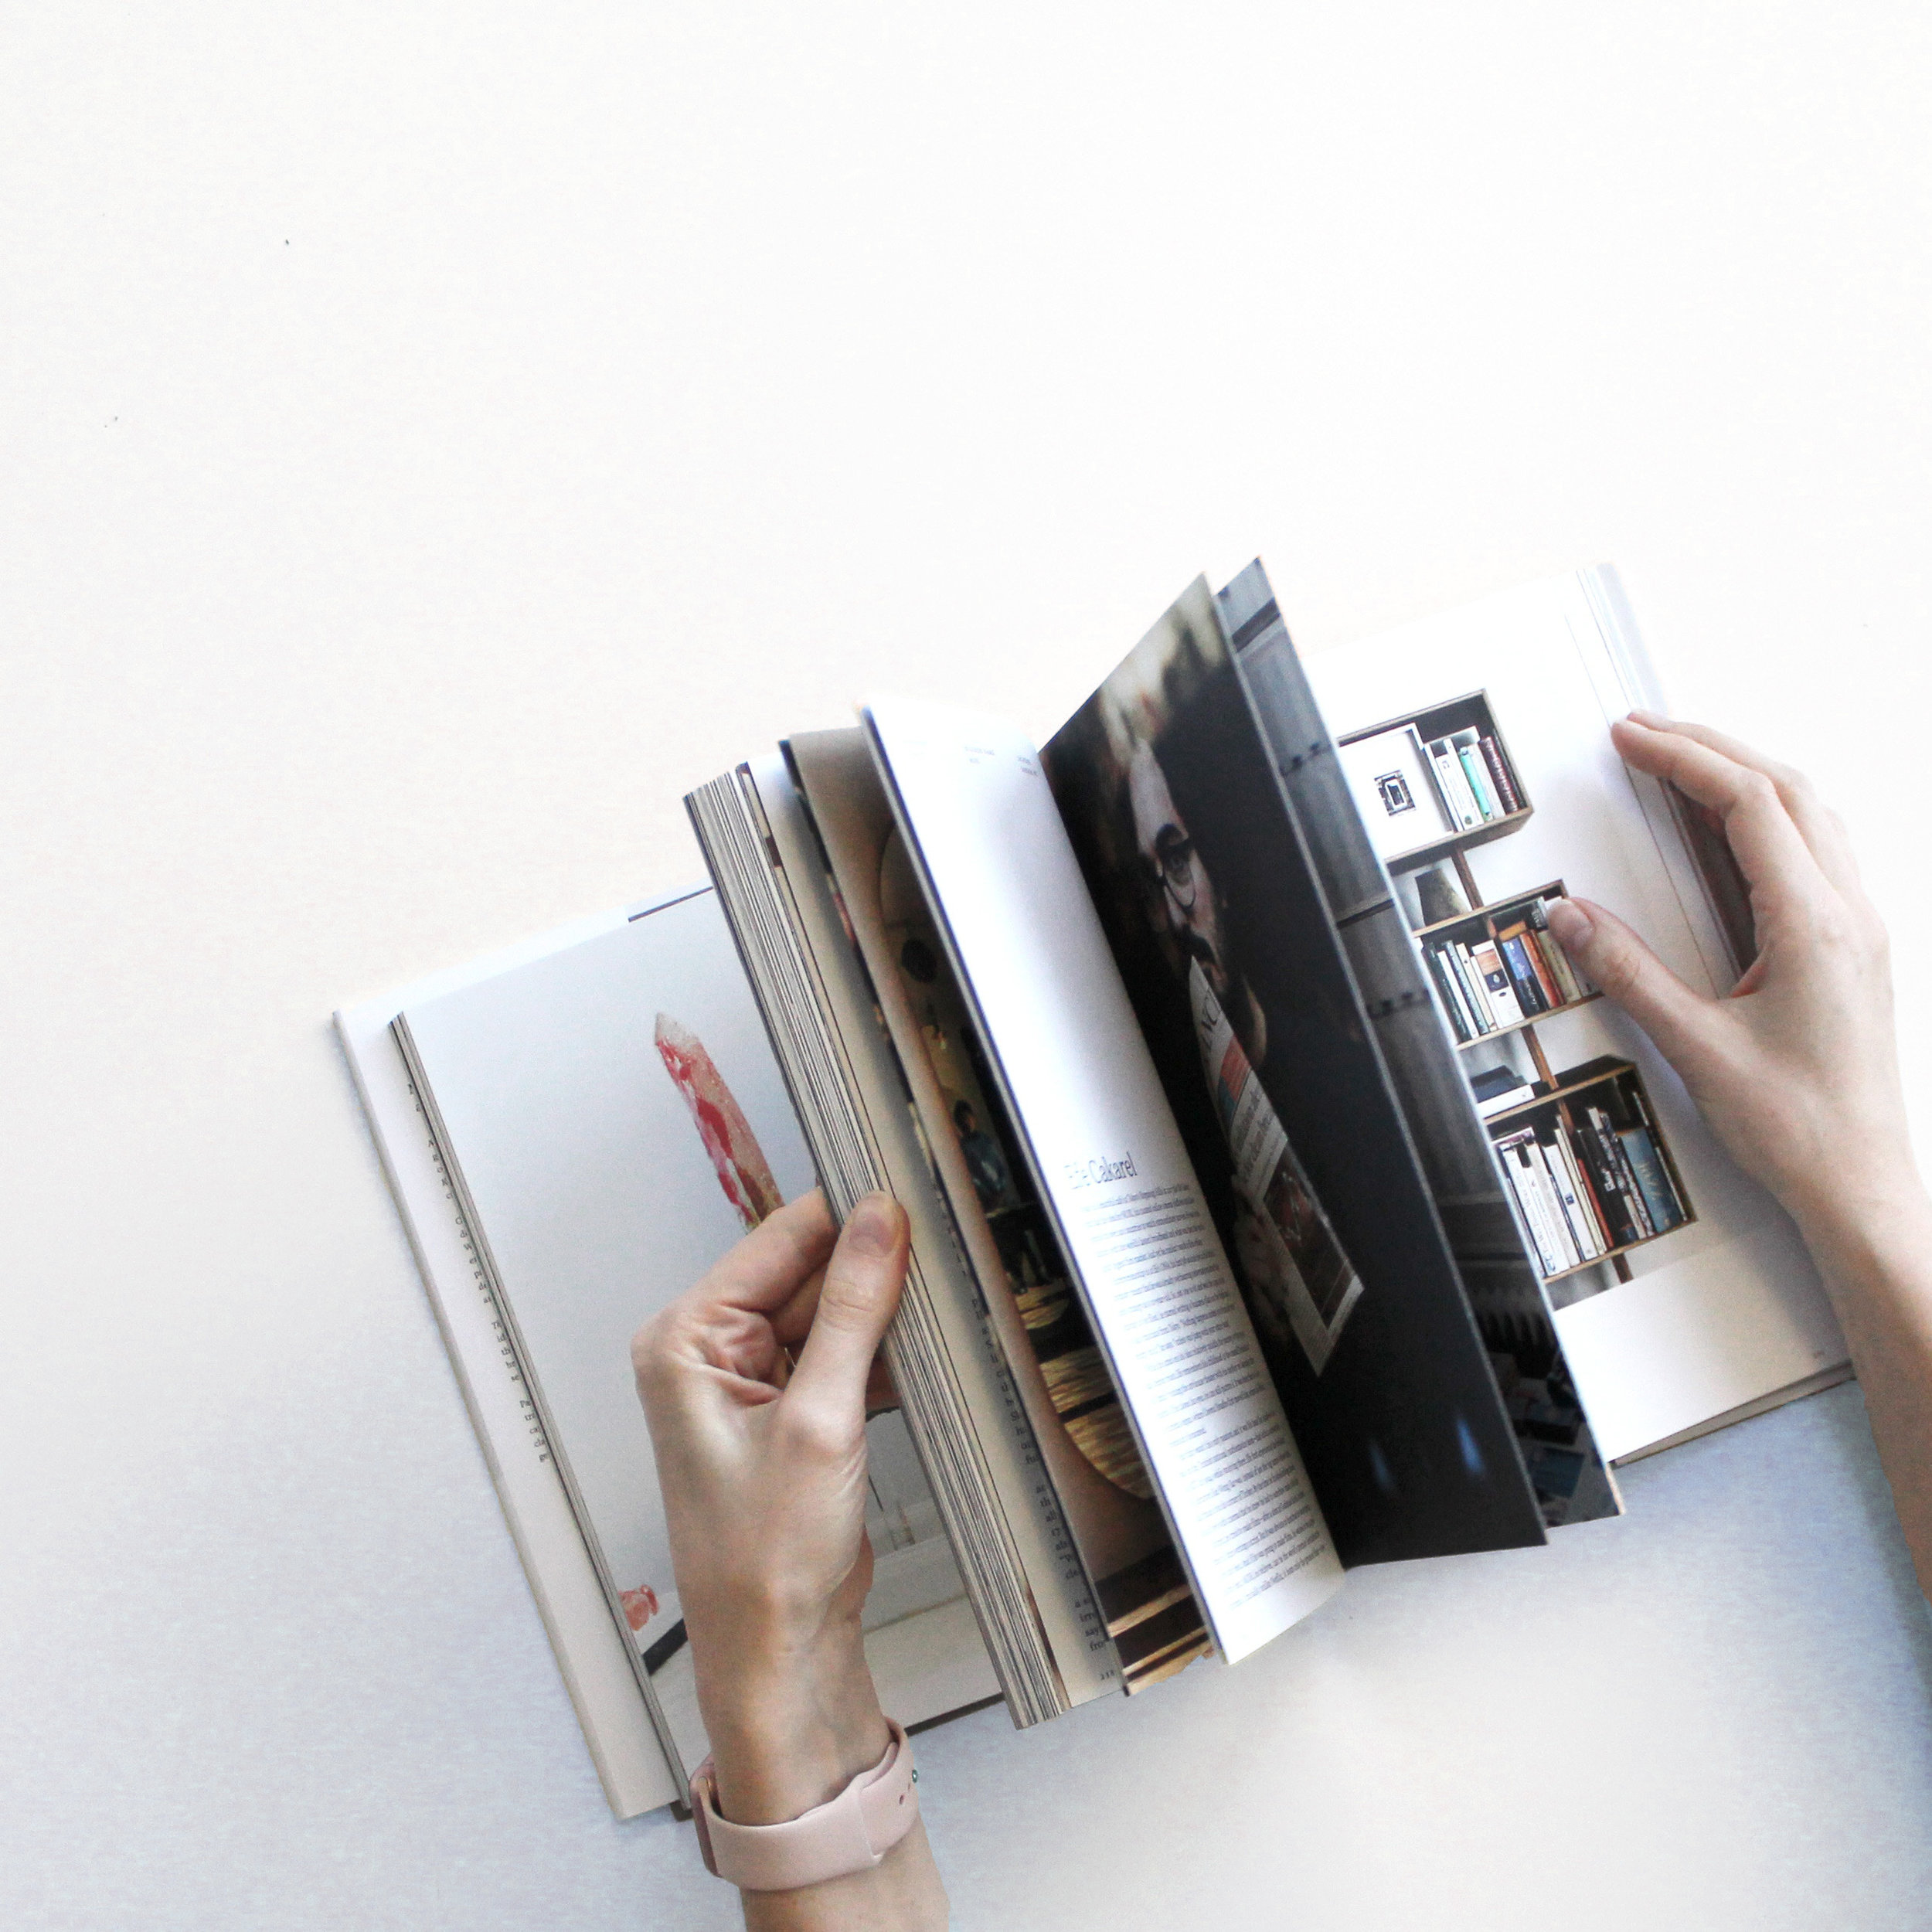 Magazine looking through